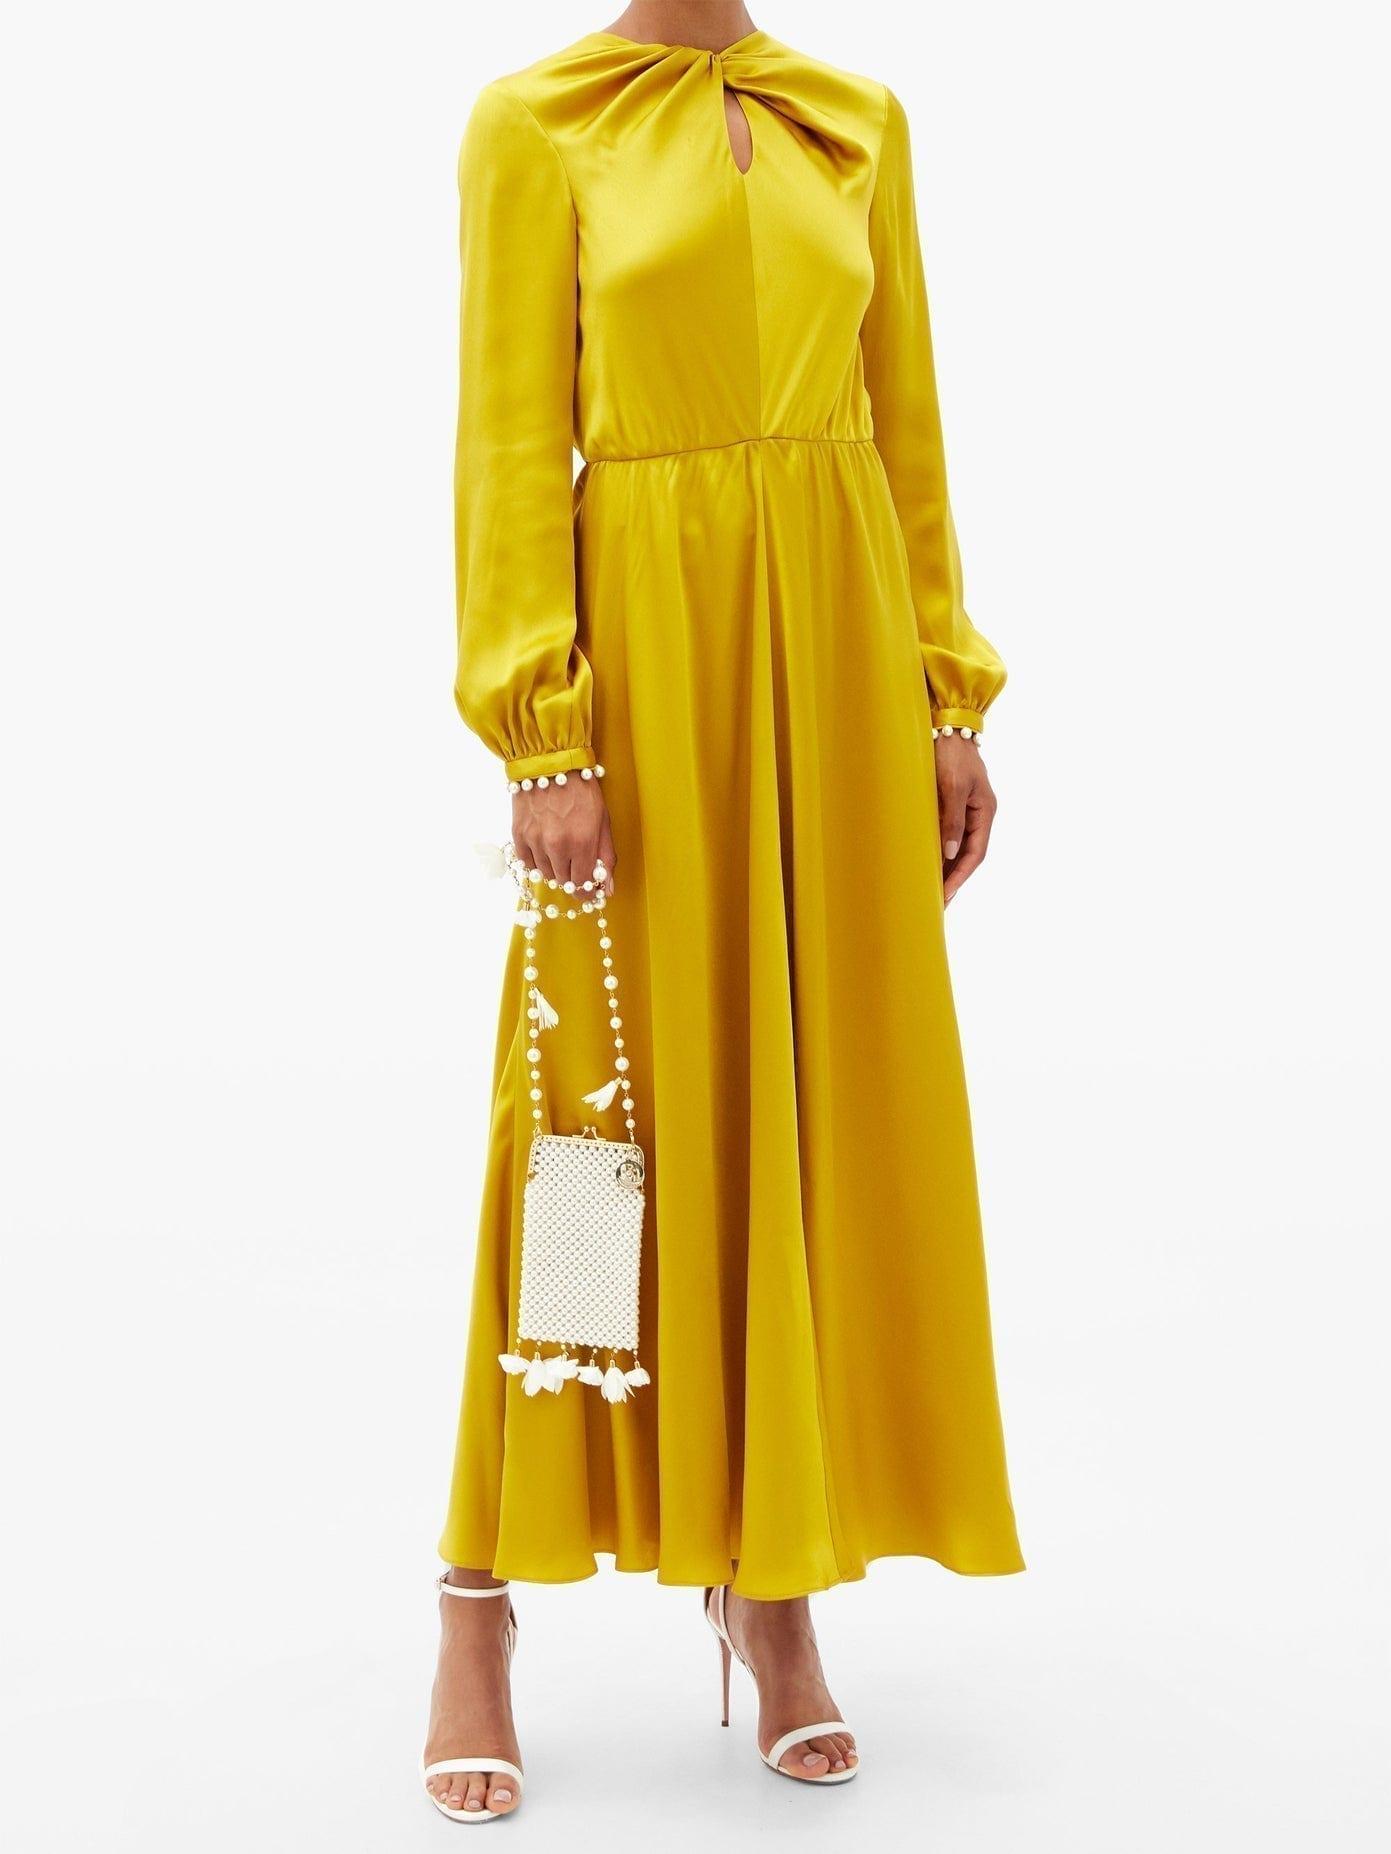 GIAMBATTISTA VALLI Twisted-front Pearl-embellished Silk-satin Dress